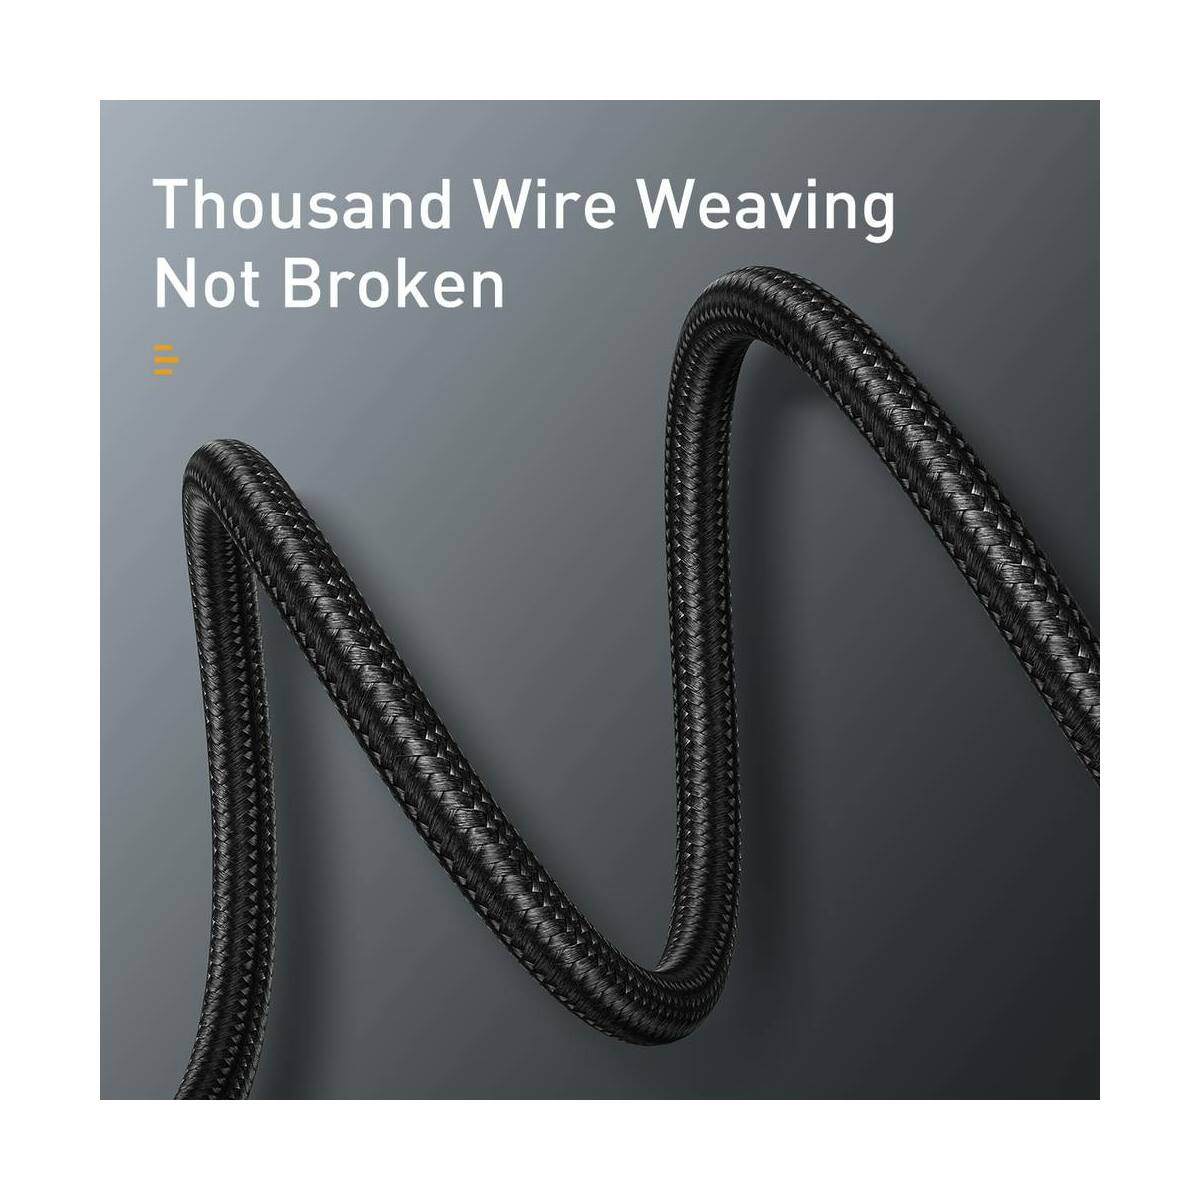 Baseus Type-C kábel, Halo jelzőfény, adatkábel, PD2.0 60W (20V 3A) 0.5m, fekete (CATGH-I01)